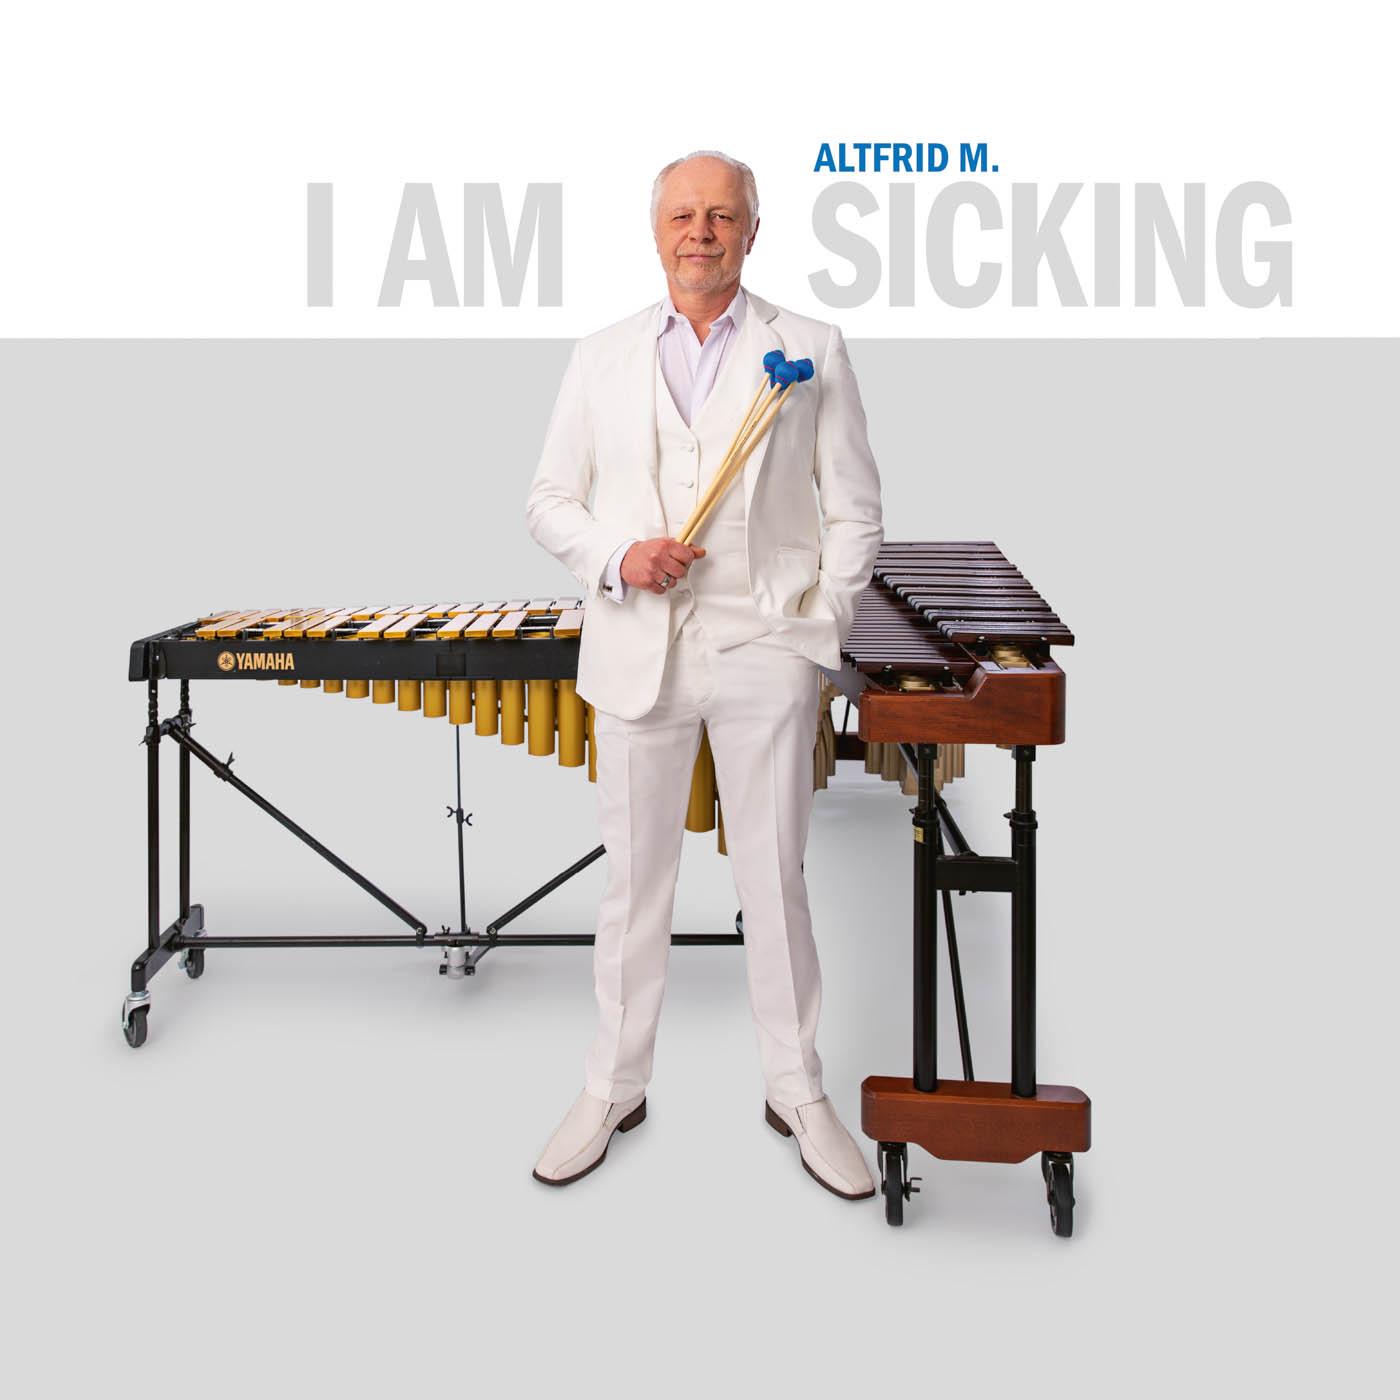 Altfrid M. Sicking